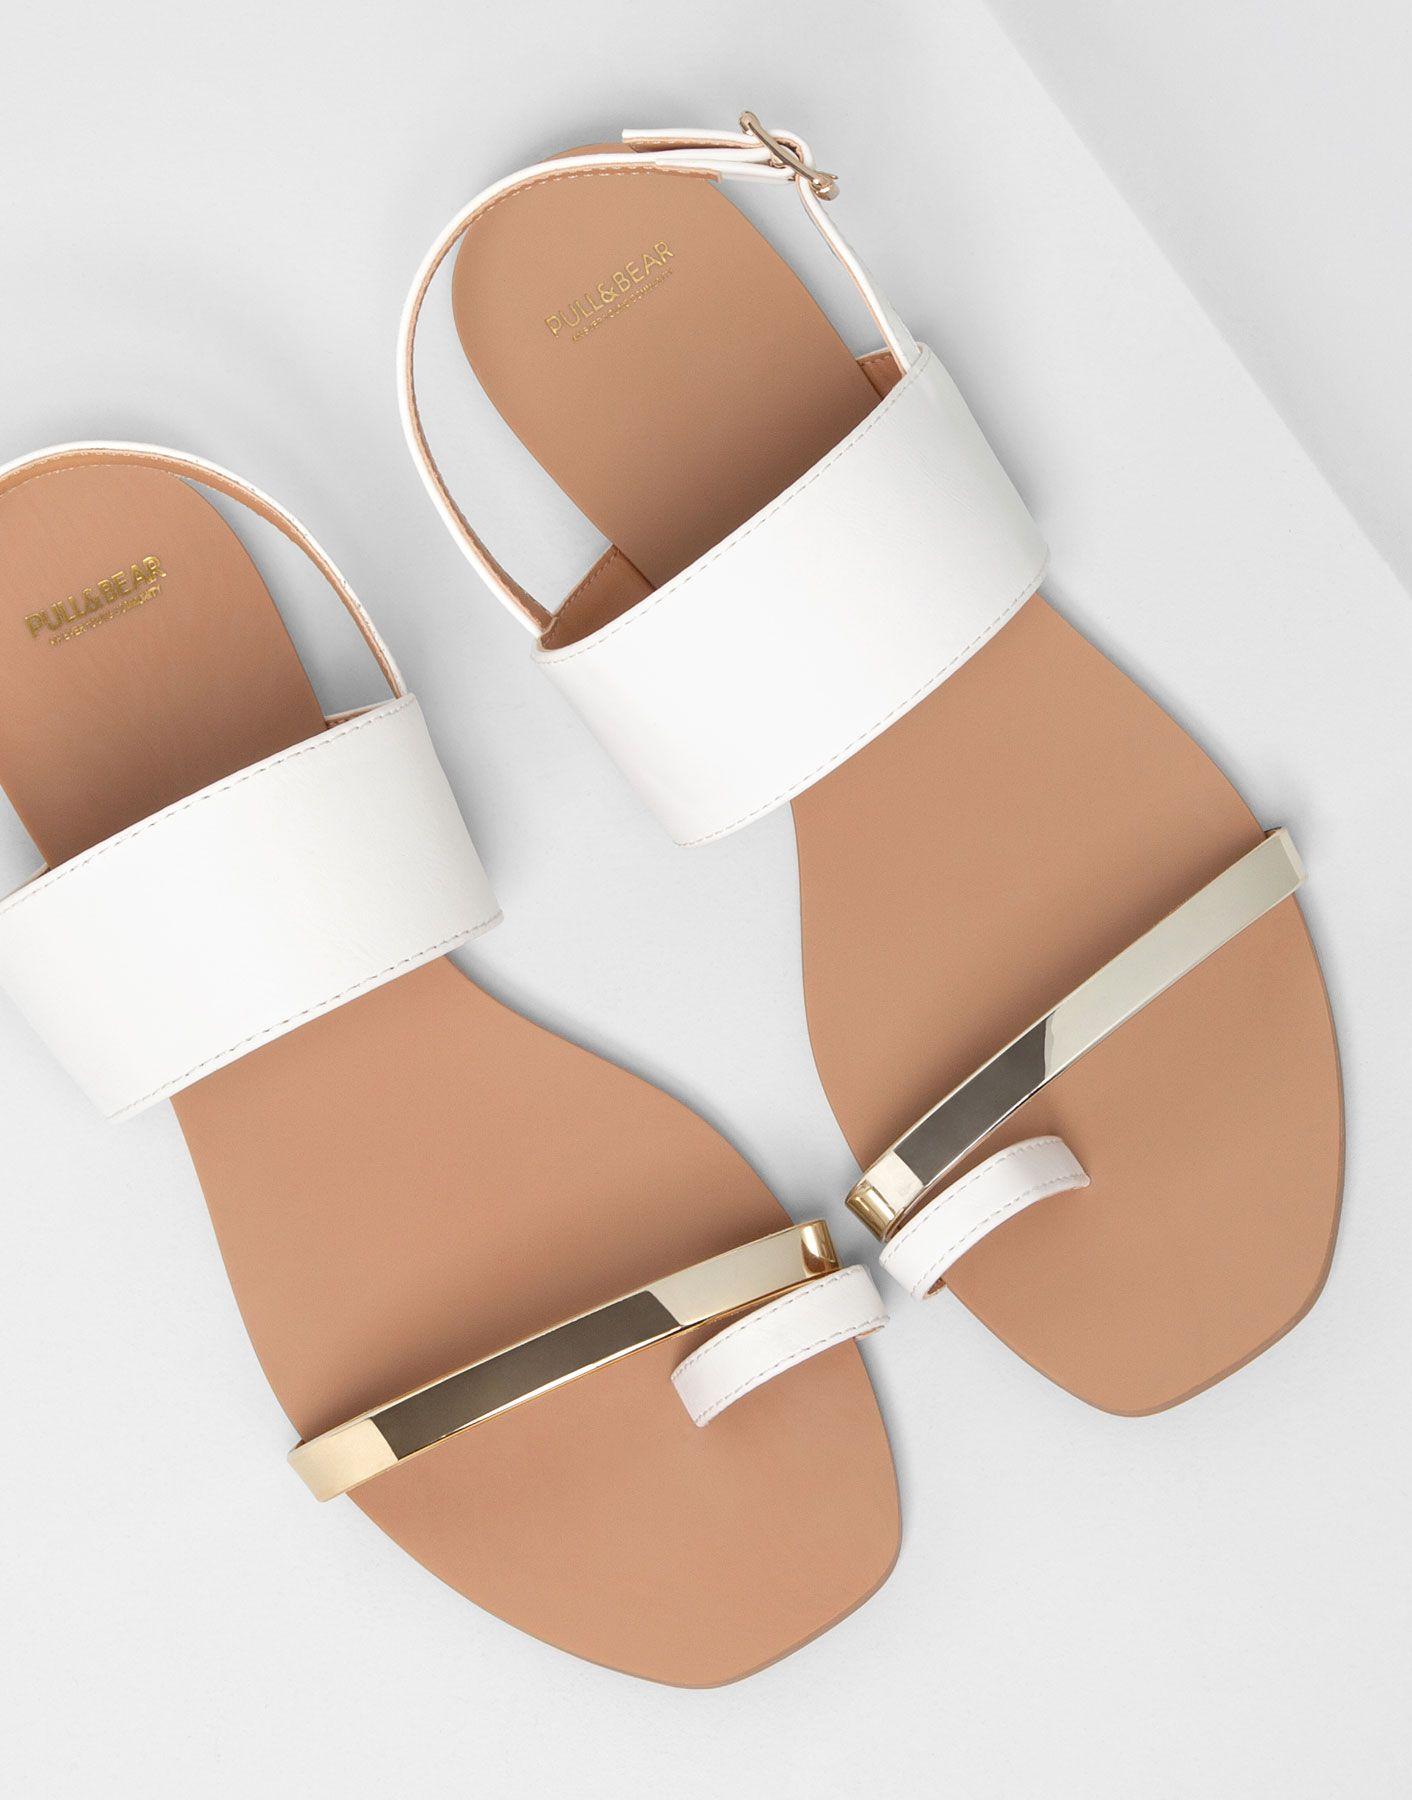 51c4b6d53 Pull   Bear Metallic Sandals in White Gold